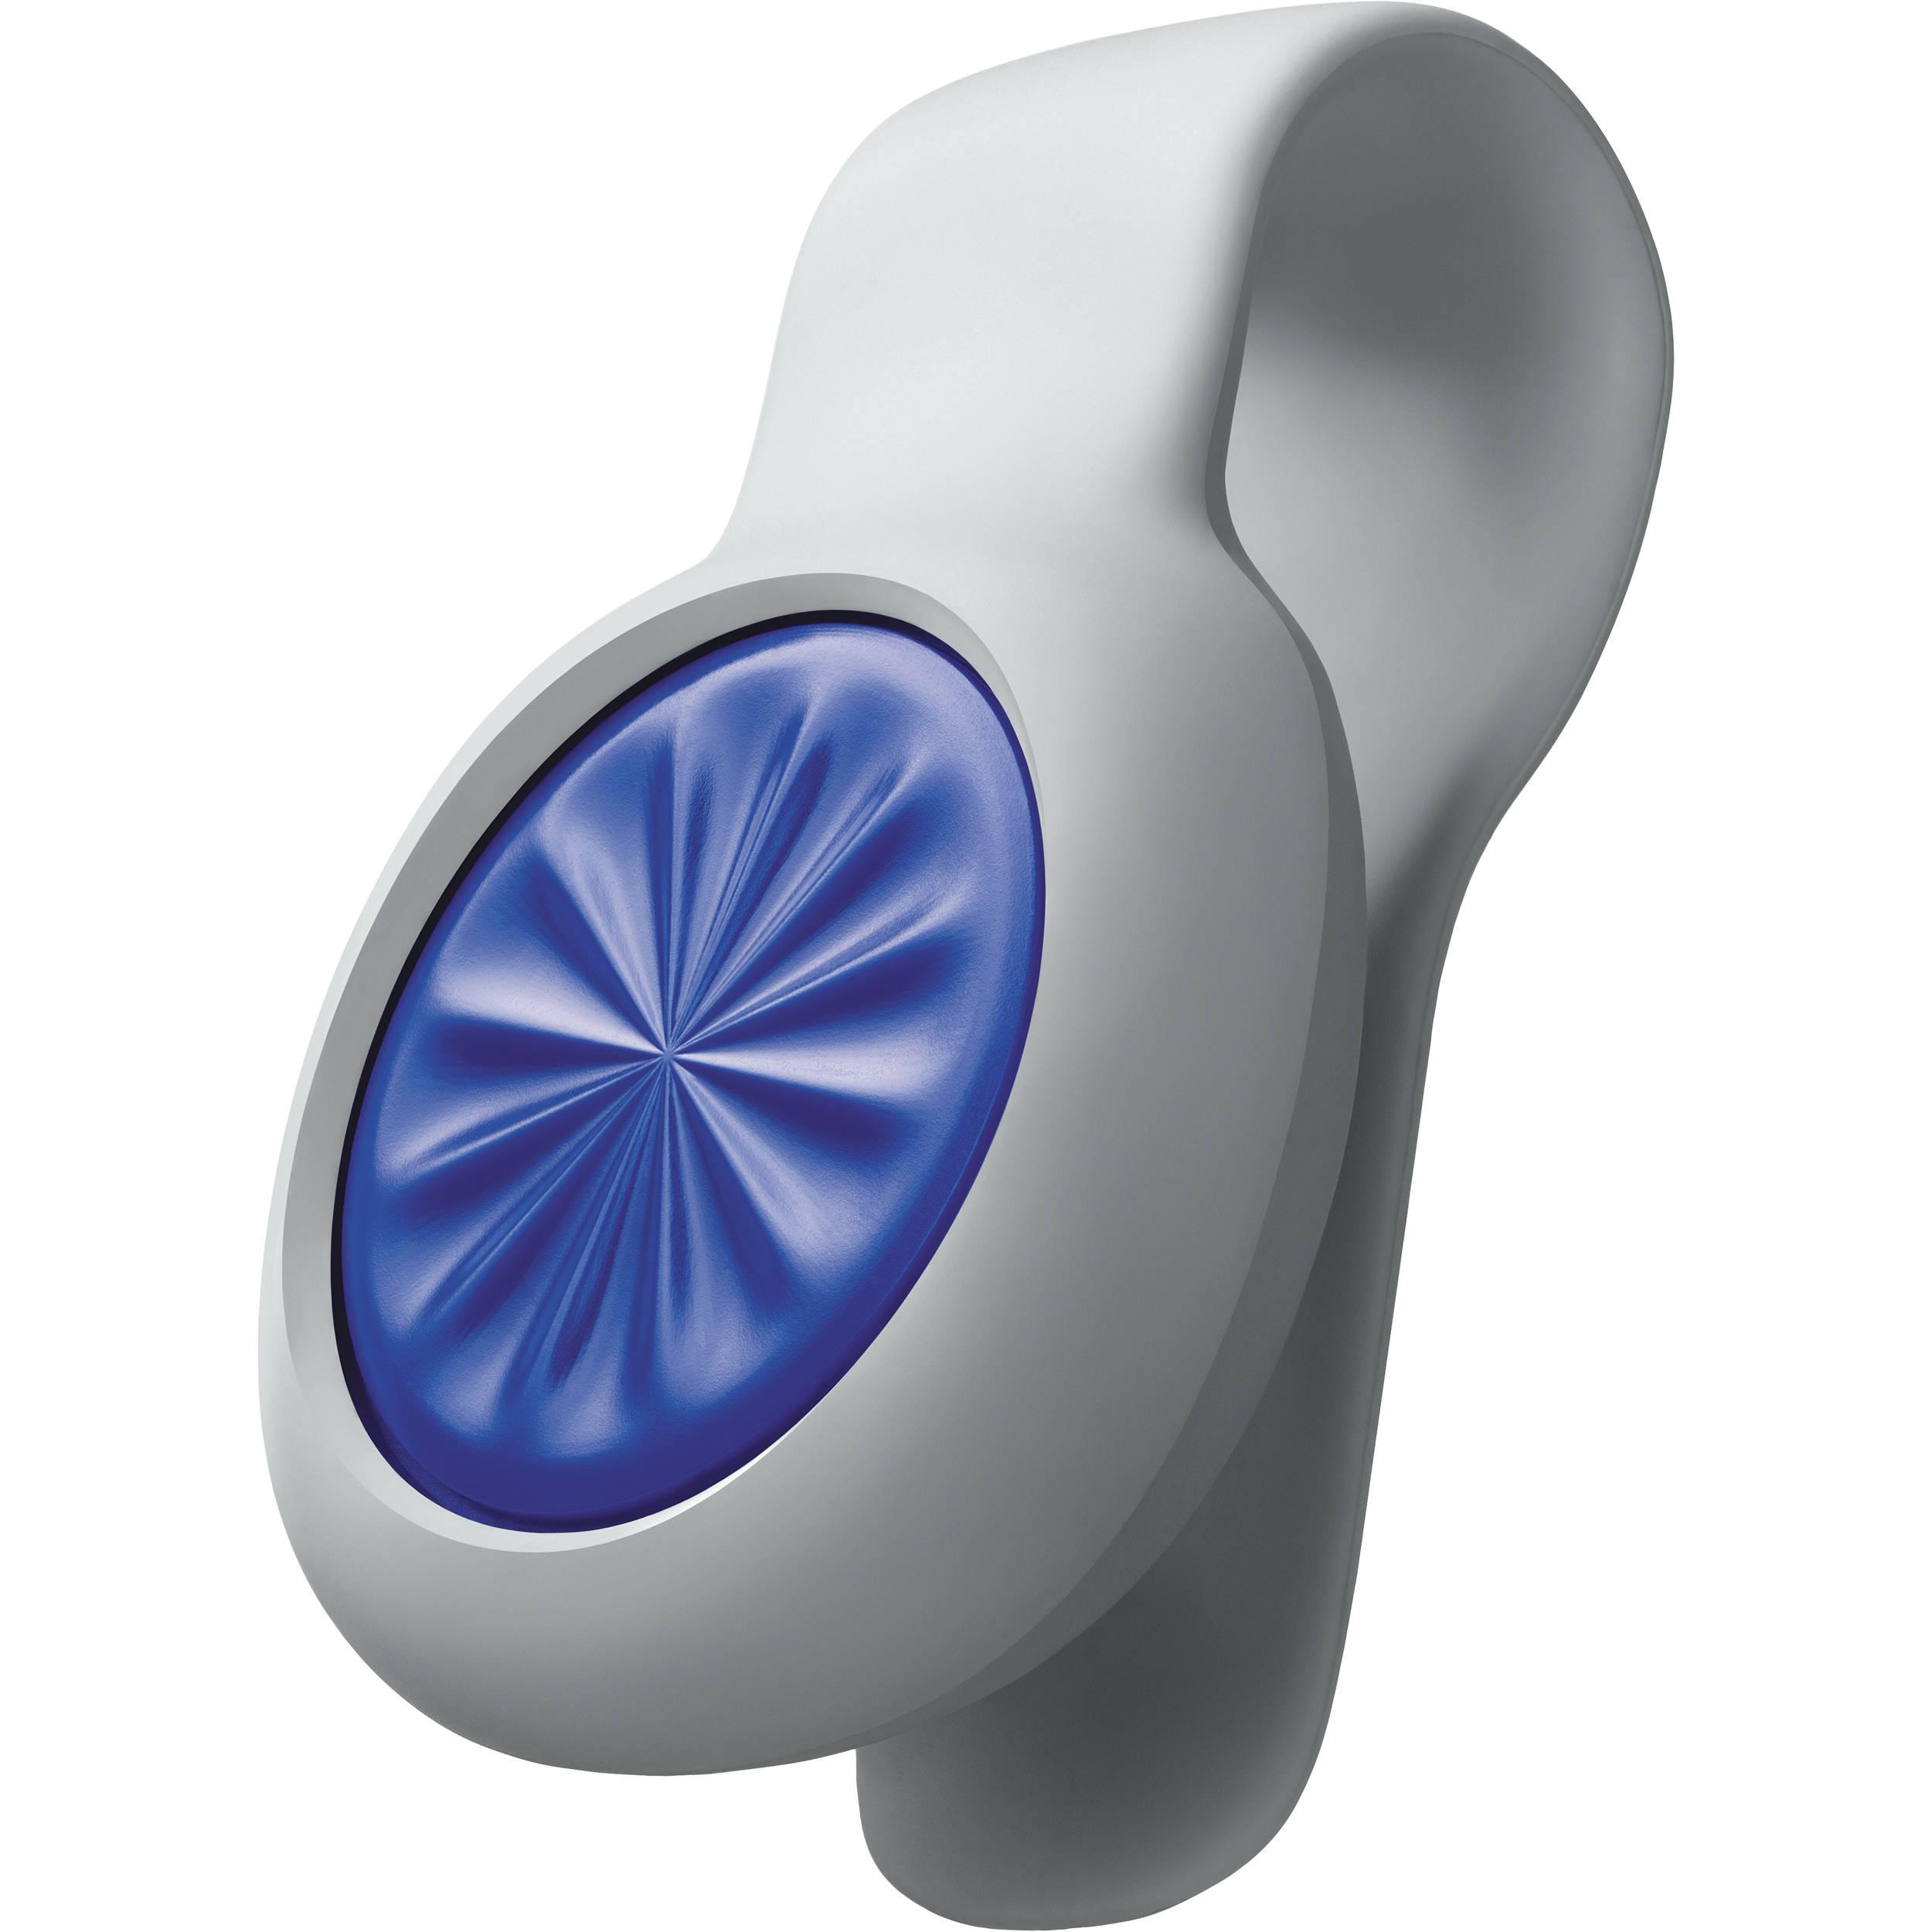 Jawbone UP MOVE Activity Tracker JL06-06B01-US B&H Photo Video